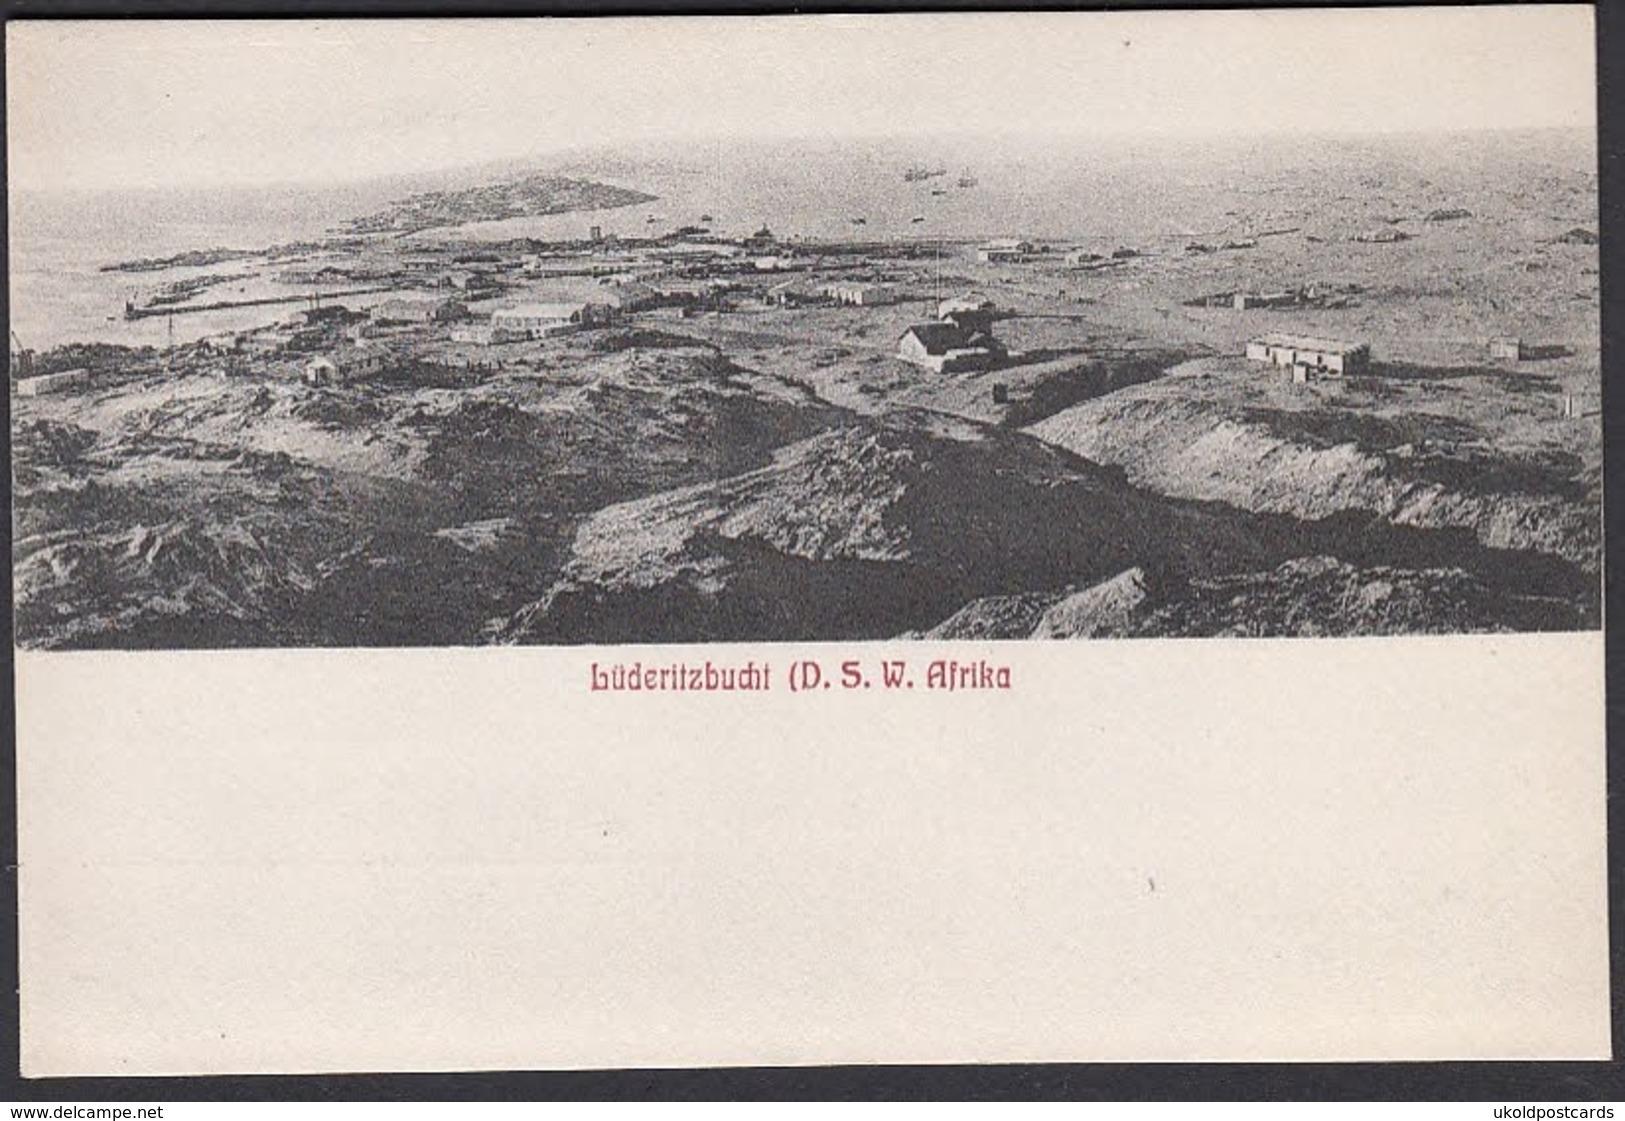 AK - NAMIBIE, ( Deutsch-Sûd West Afrika ) LUDERITZBUCHT,   D-S-W Afrika. - Namibia